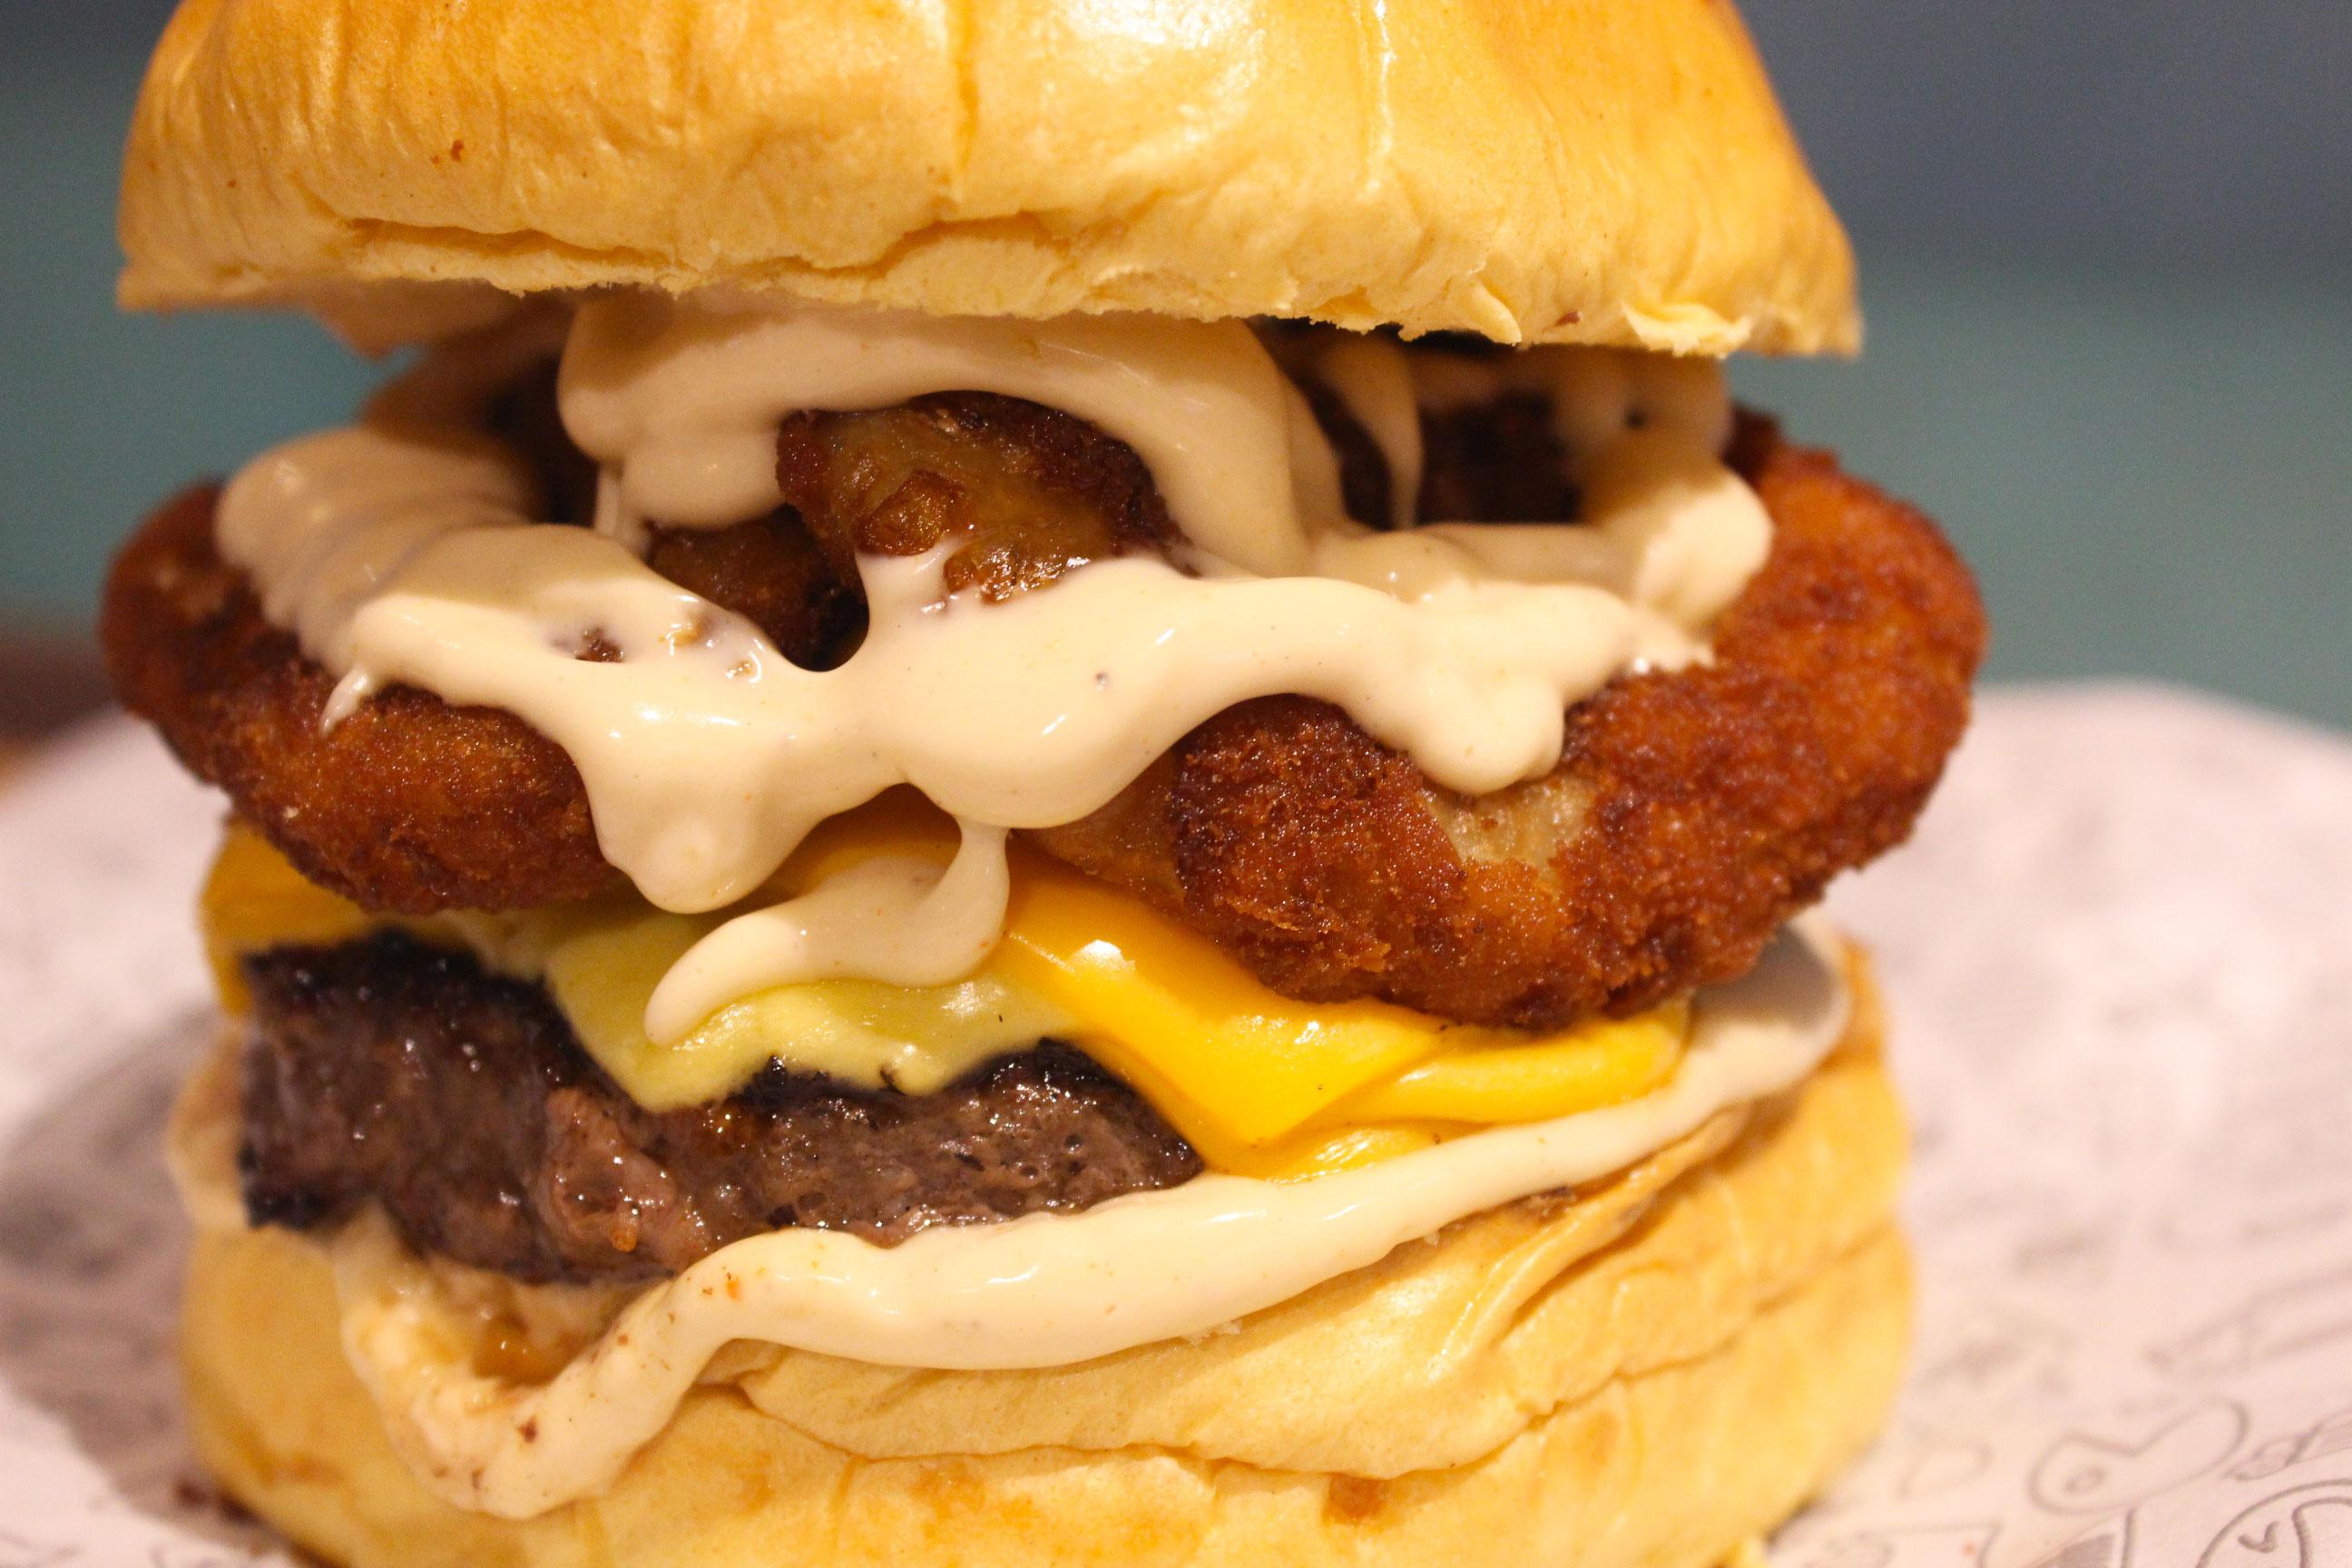 Brooklyn (pão brioche, smash burger 80g, queijo cheddar, alface, tomate, cebola, picles e molho americano) de R$17,90 por apenas R$12,90